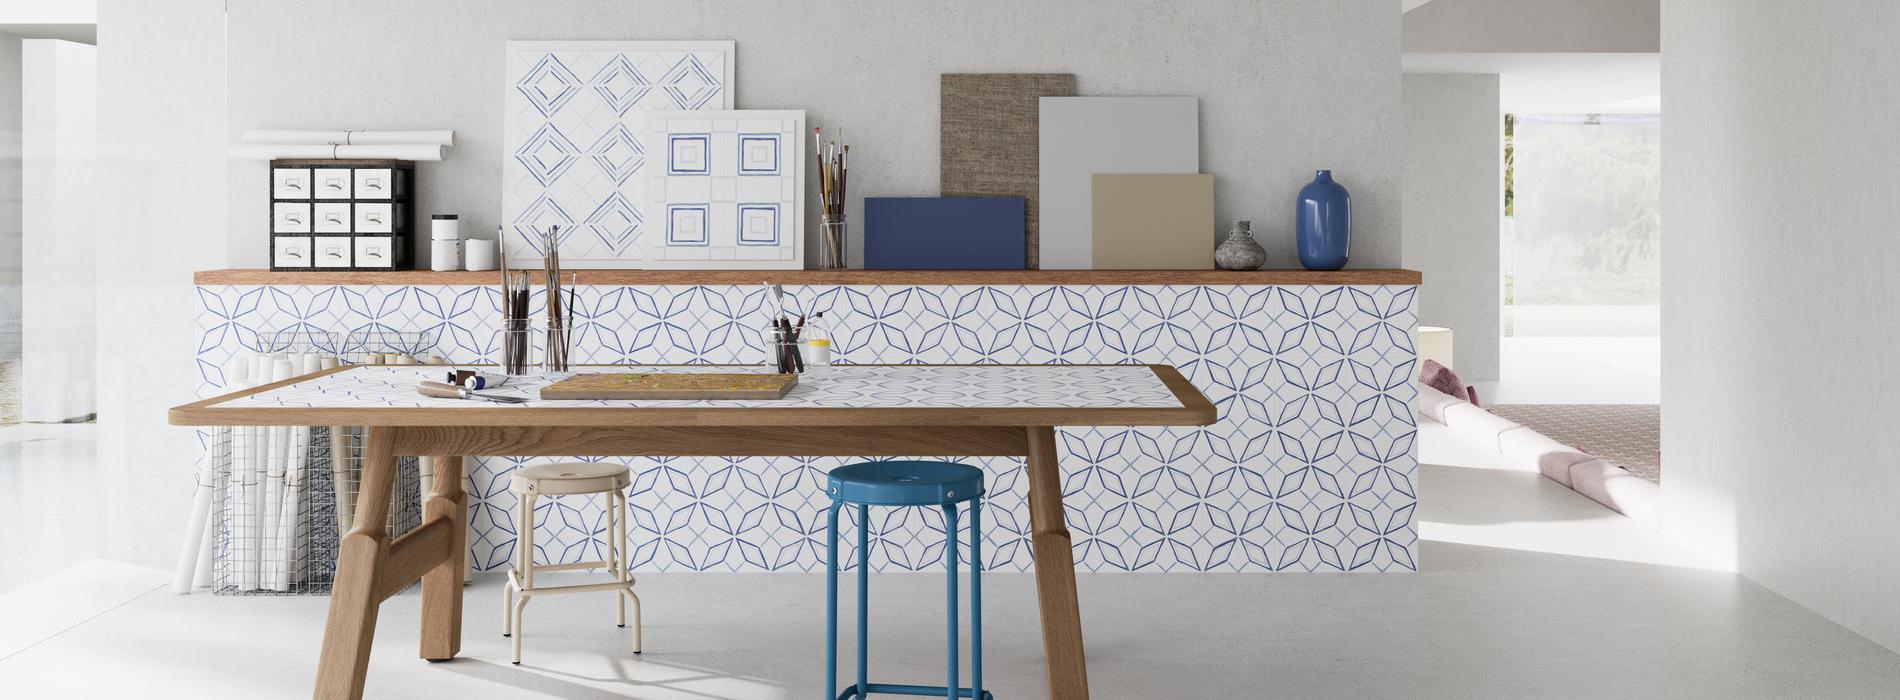 draw azulejos cresan3